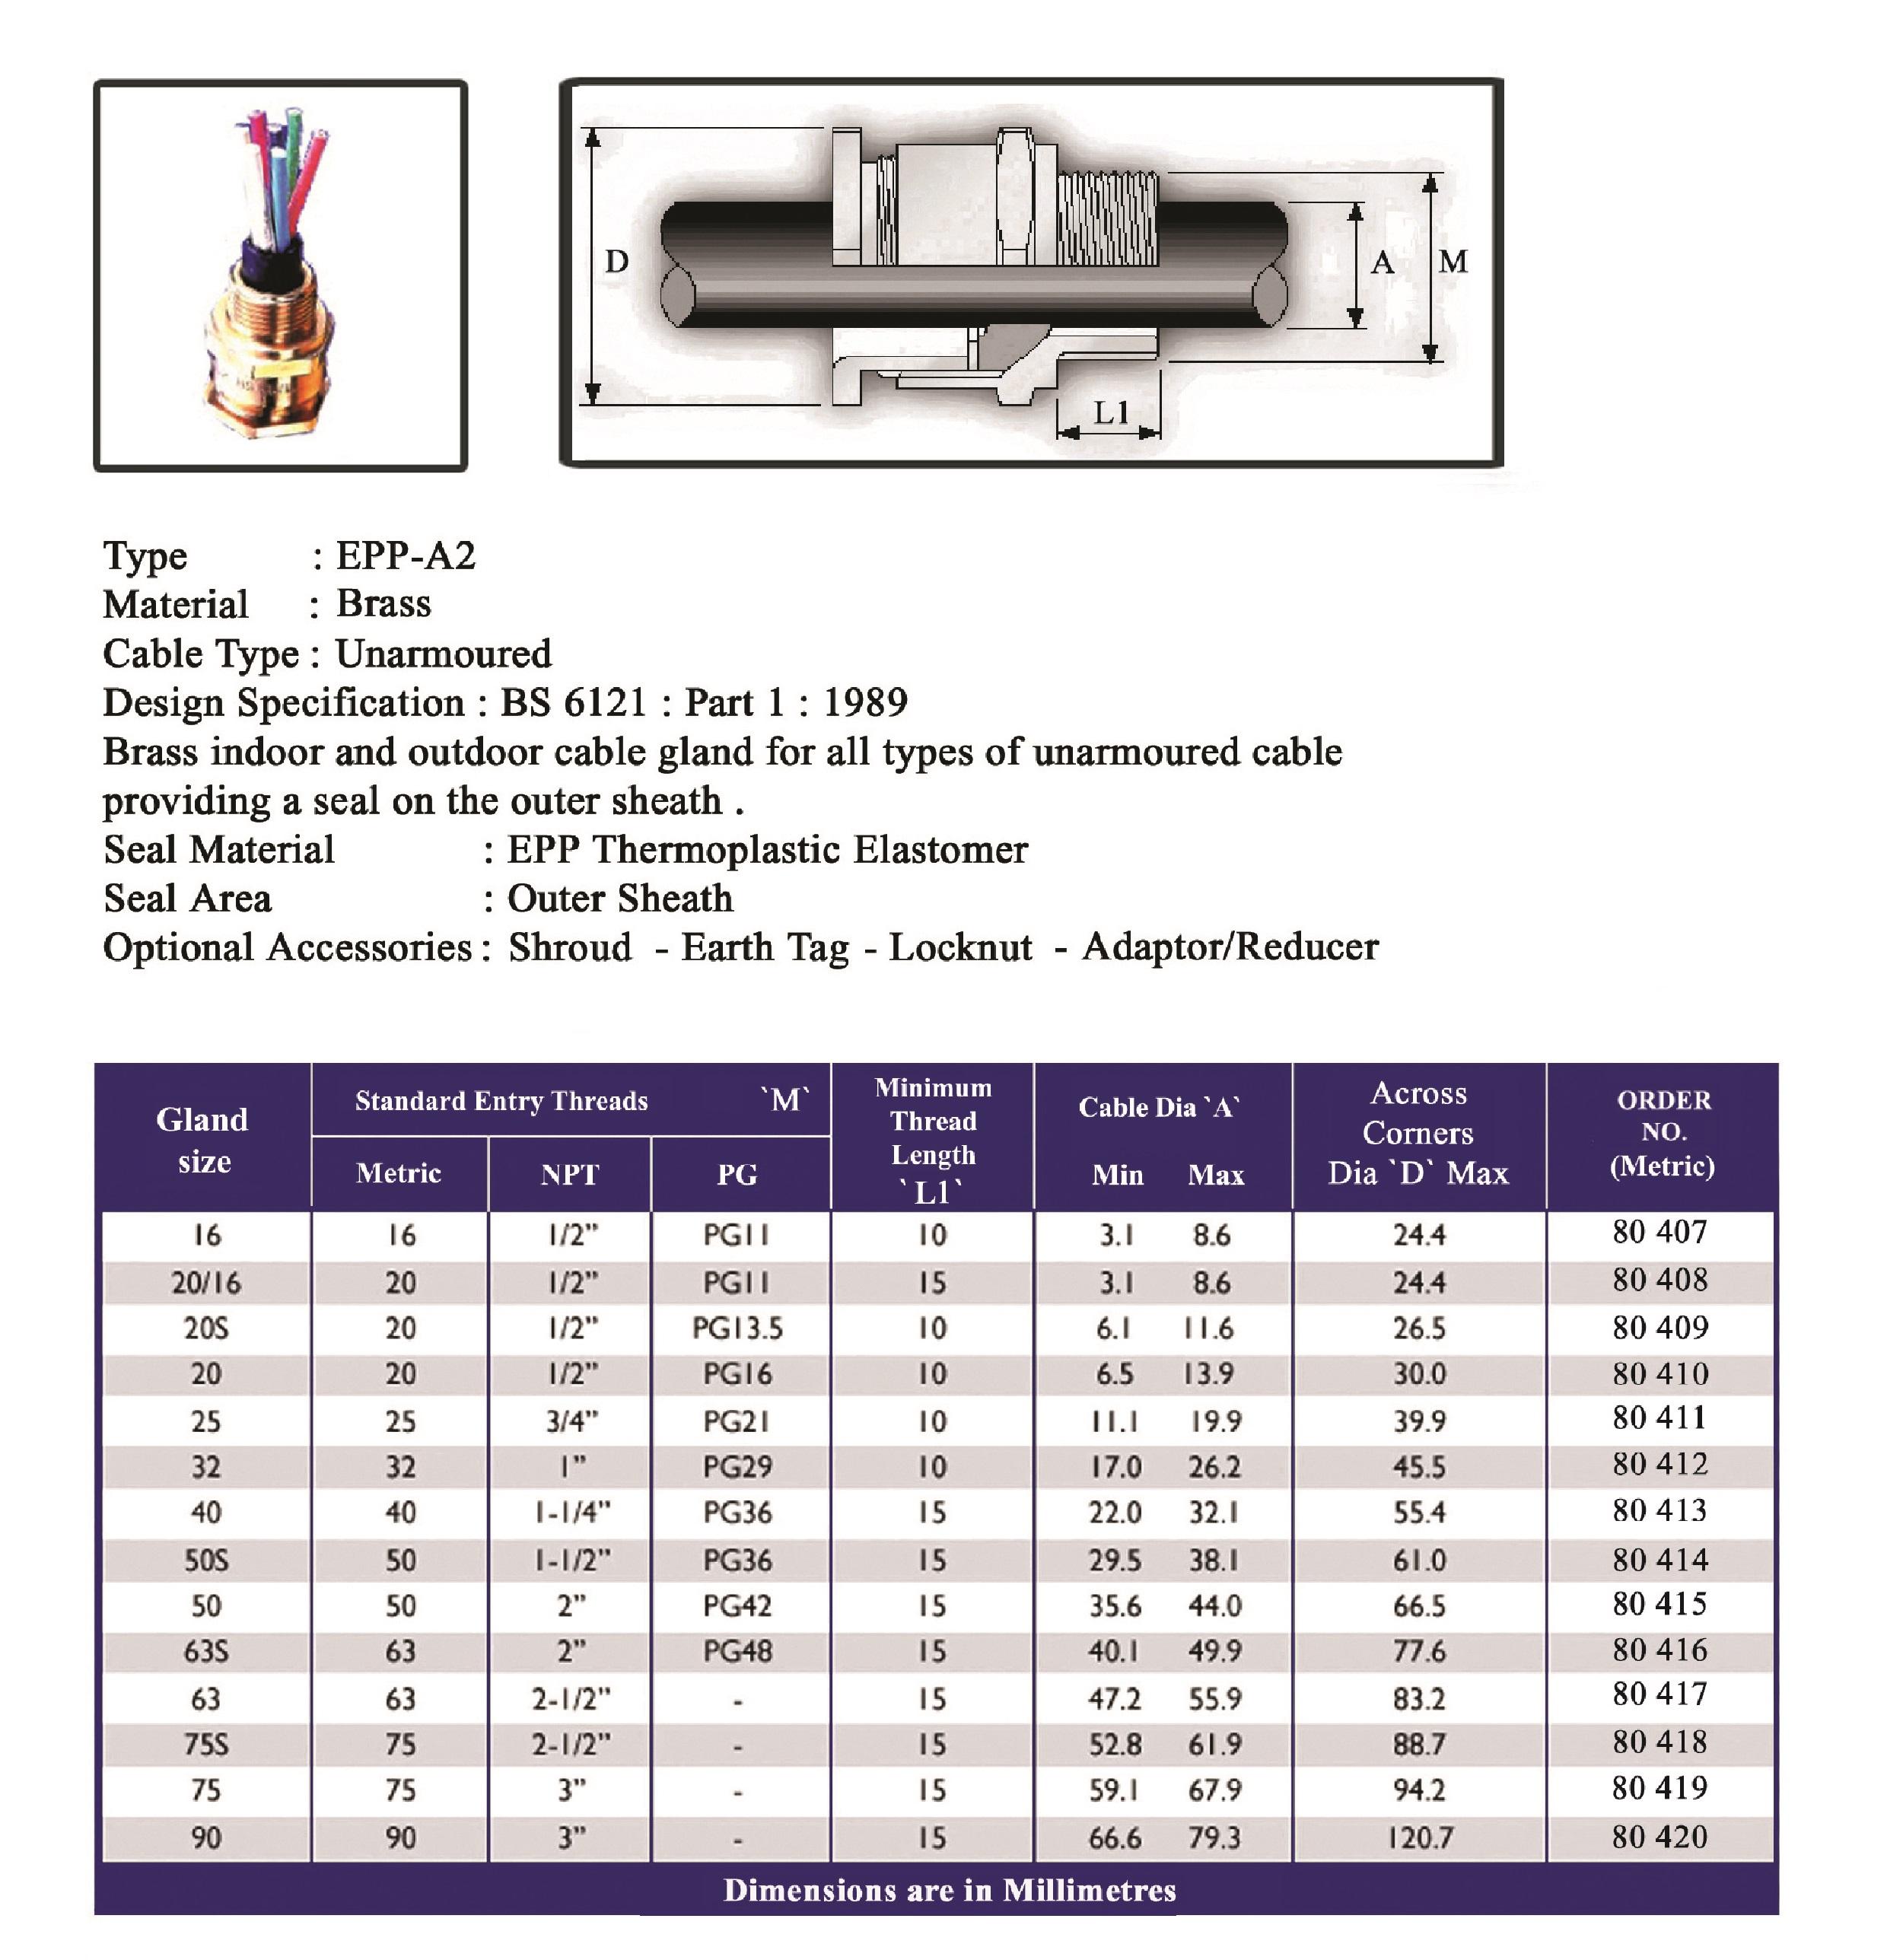 E.P.P - A2 Technical Datasheet